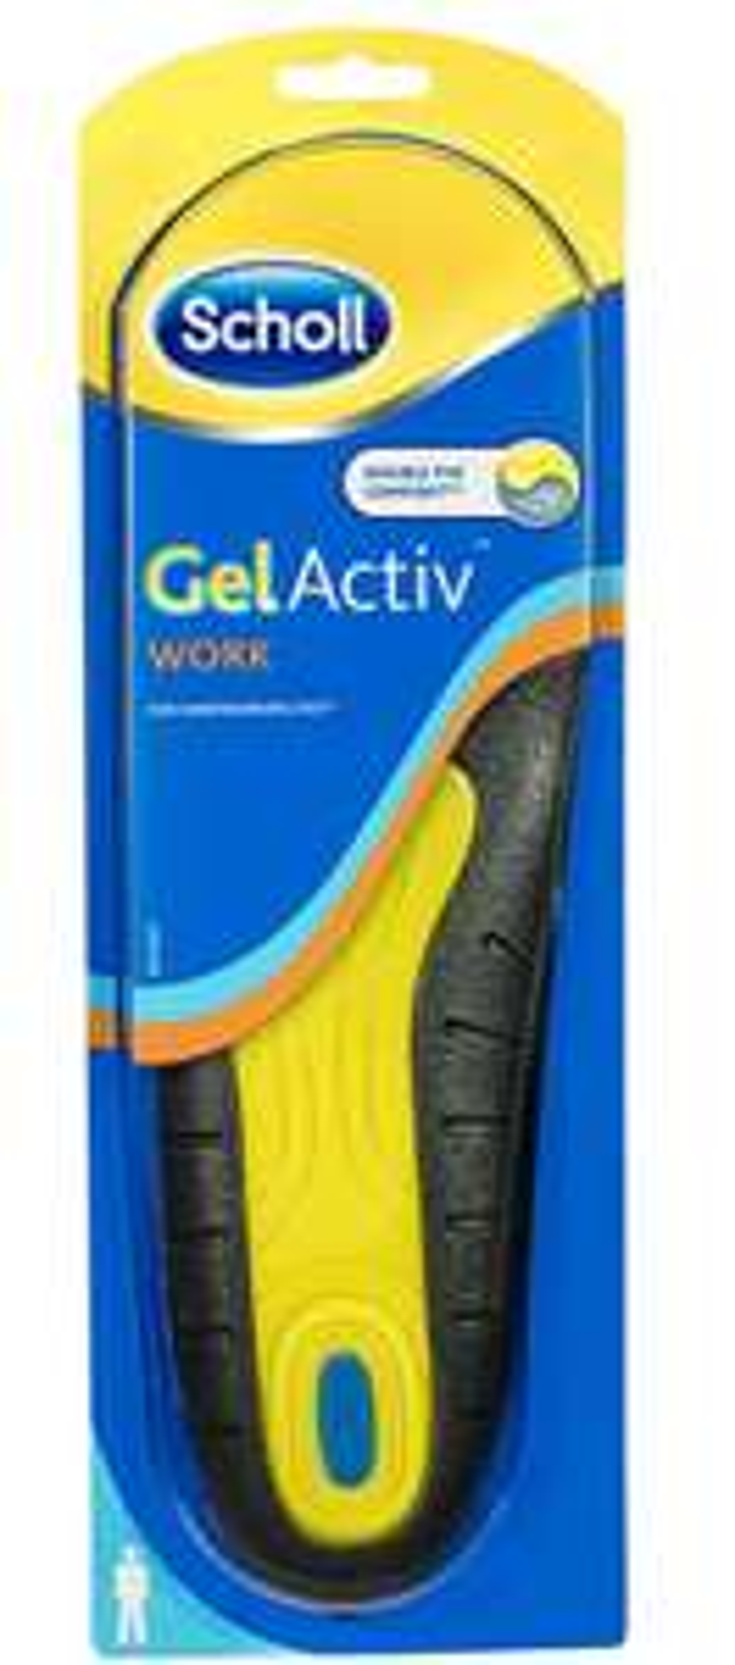 Scholl Gel Mens Insoles Pair UK 7-12 £6.25 (£5.09 with S&S) @ Amazon